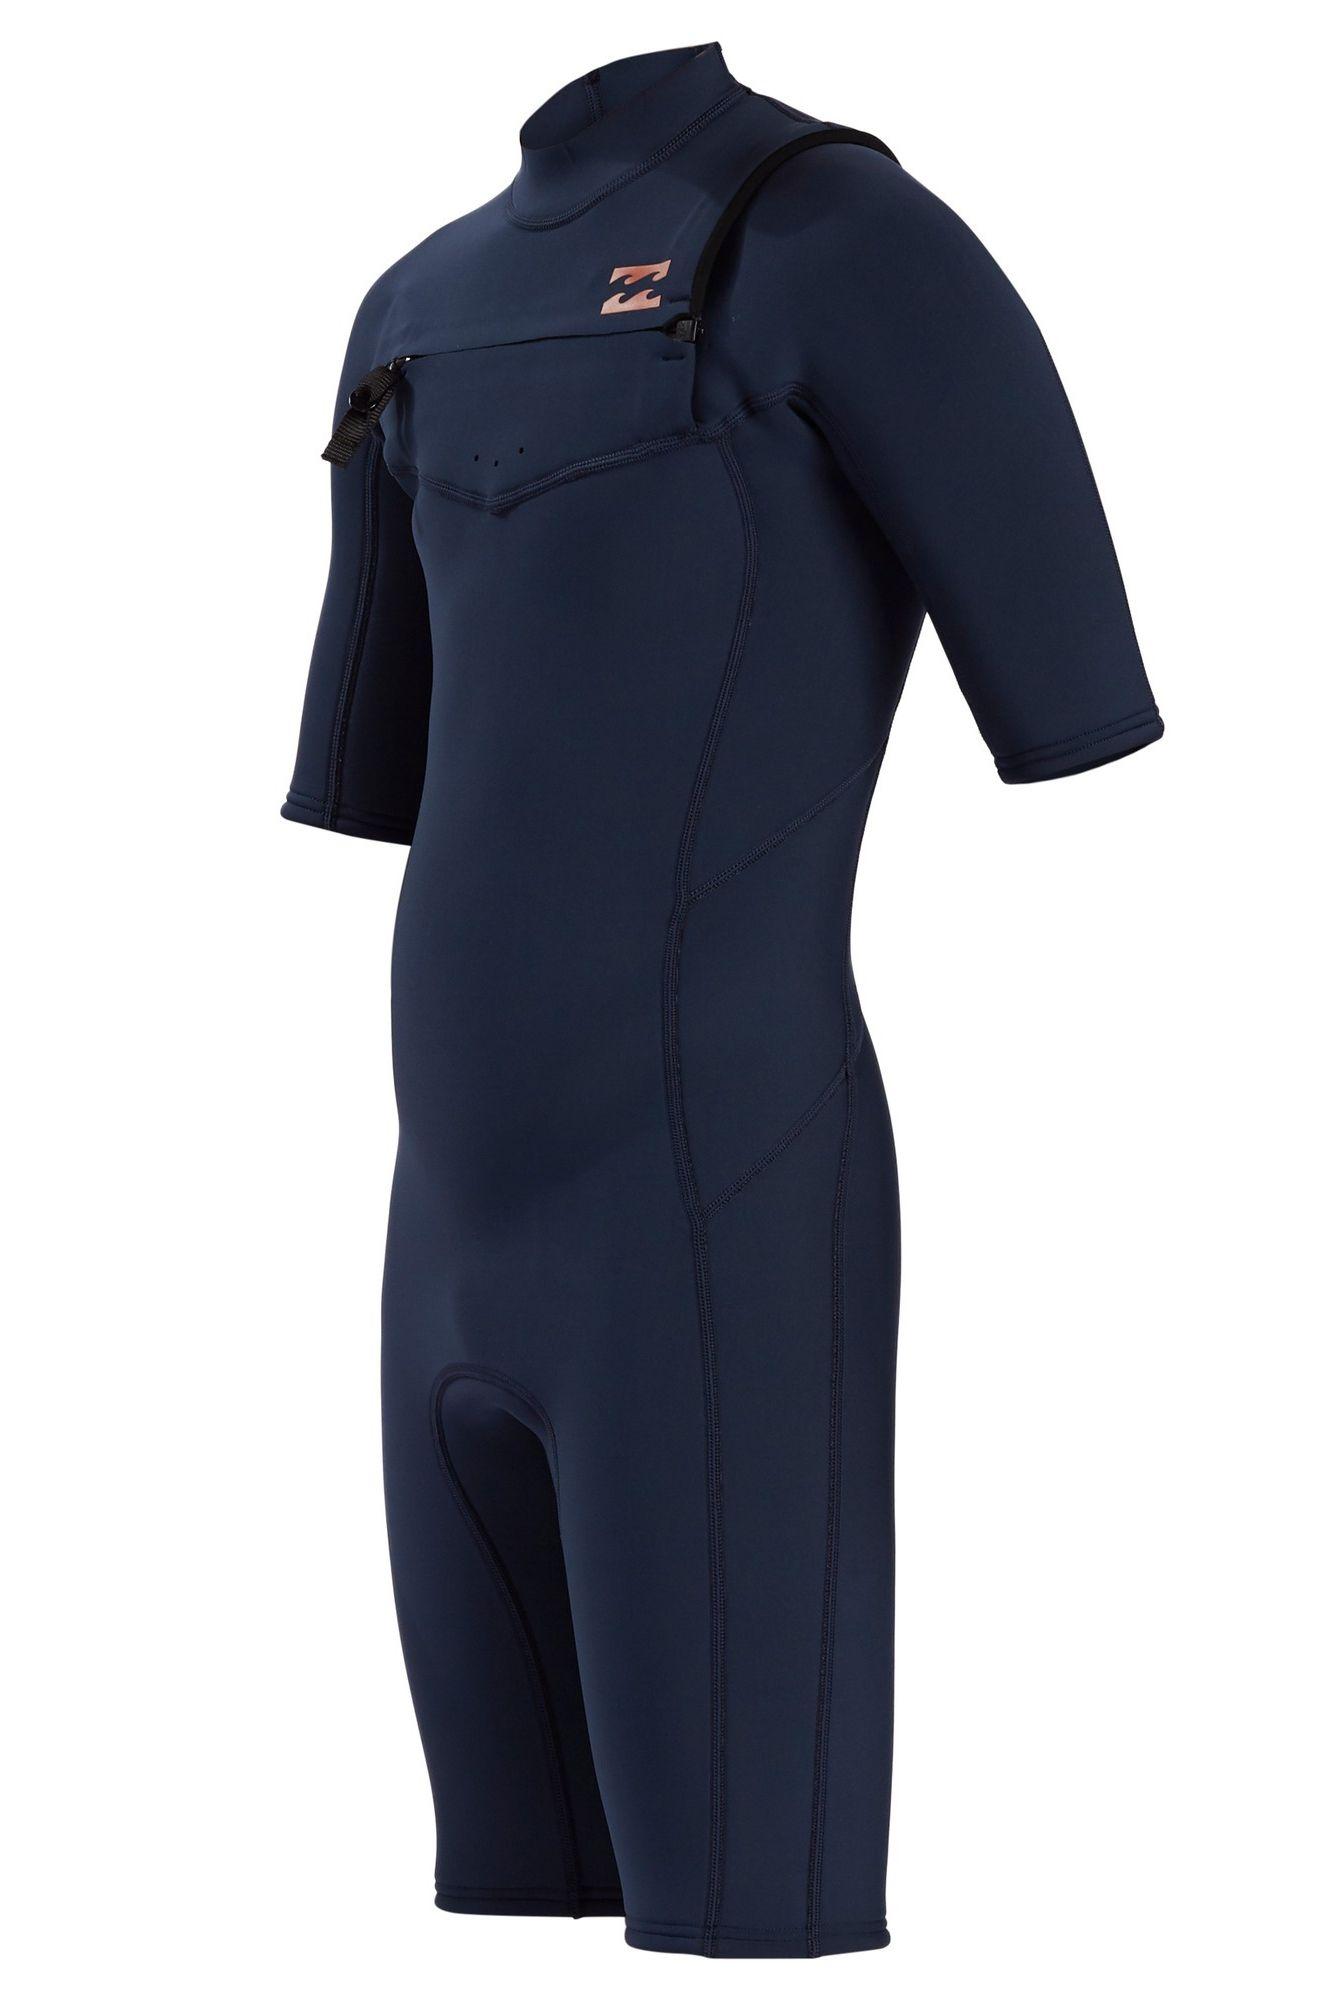 Billabong Wetsuit 202 BOYS ABSO CZ FL Slate Blue 2x2mm